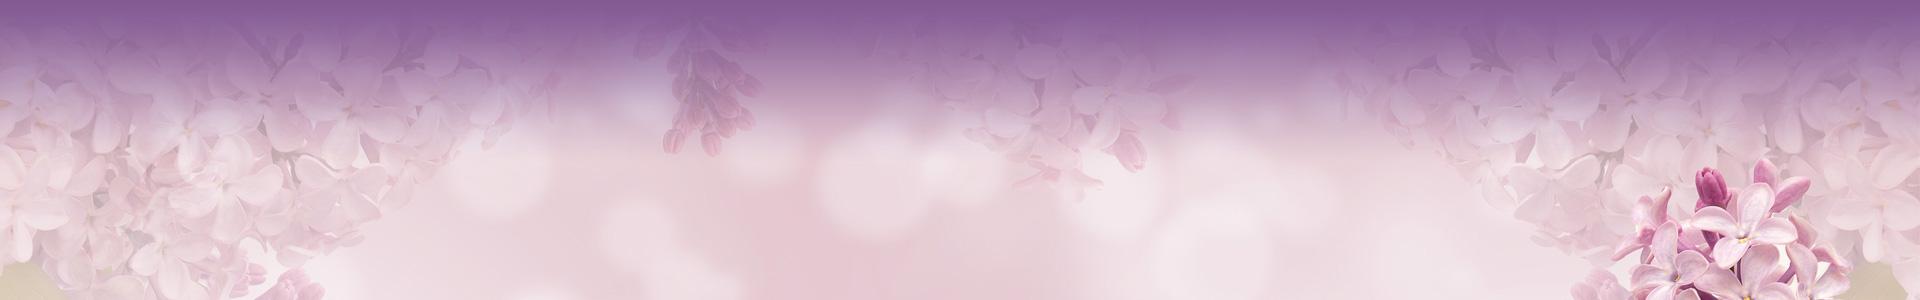 Brautjungfernkleid TWBS04 - Brautjungfernkleid aqua bodenlang Taft Spitze V-Ausschnitt Träger